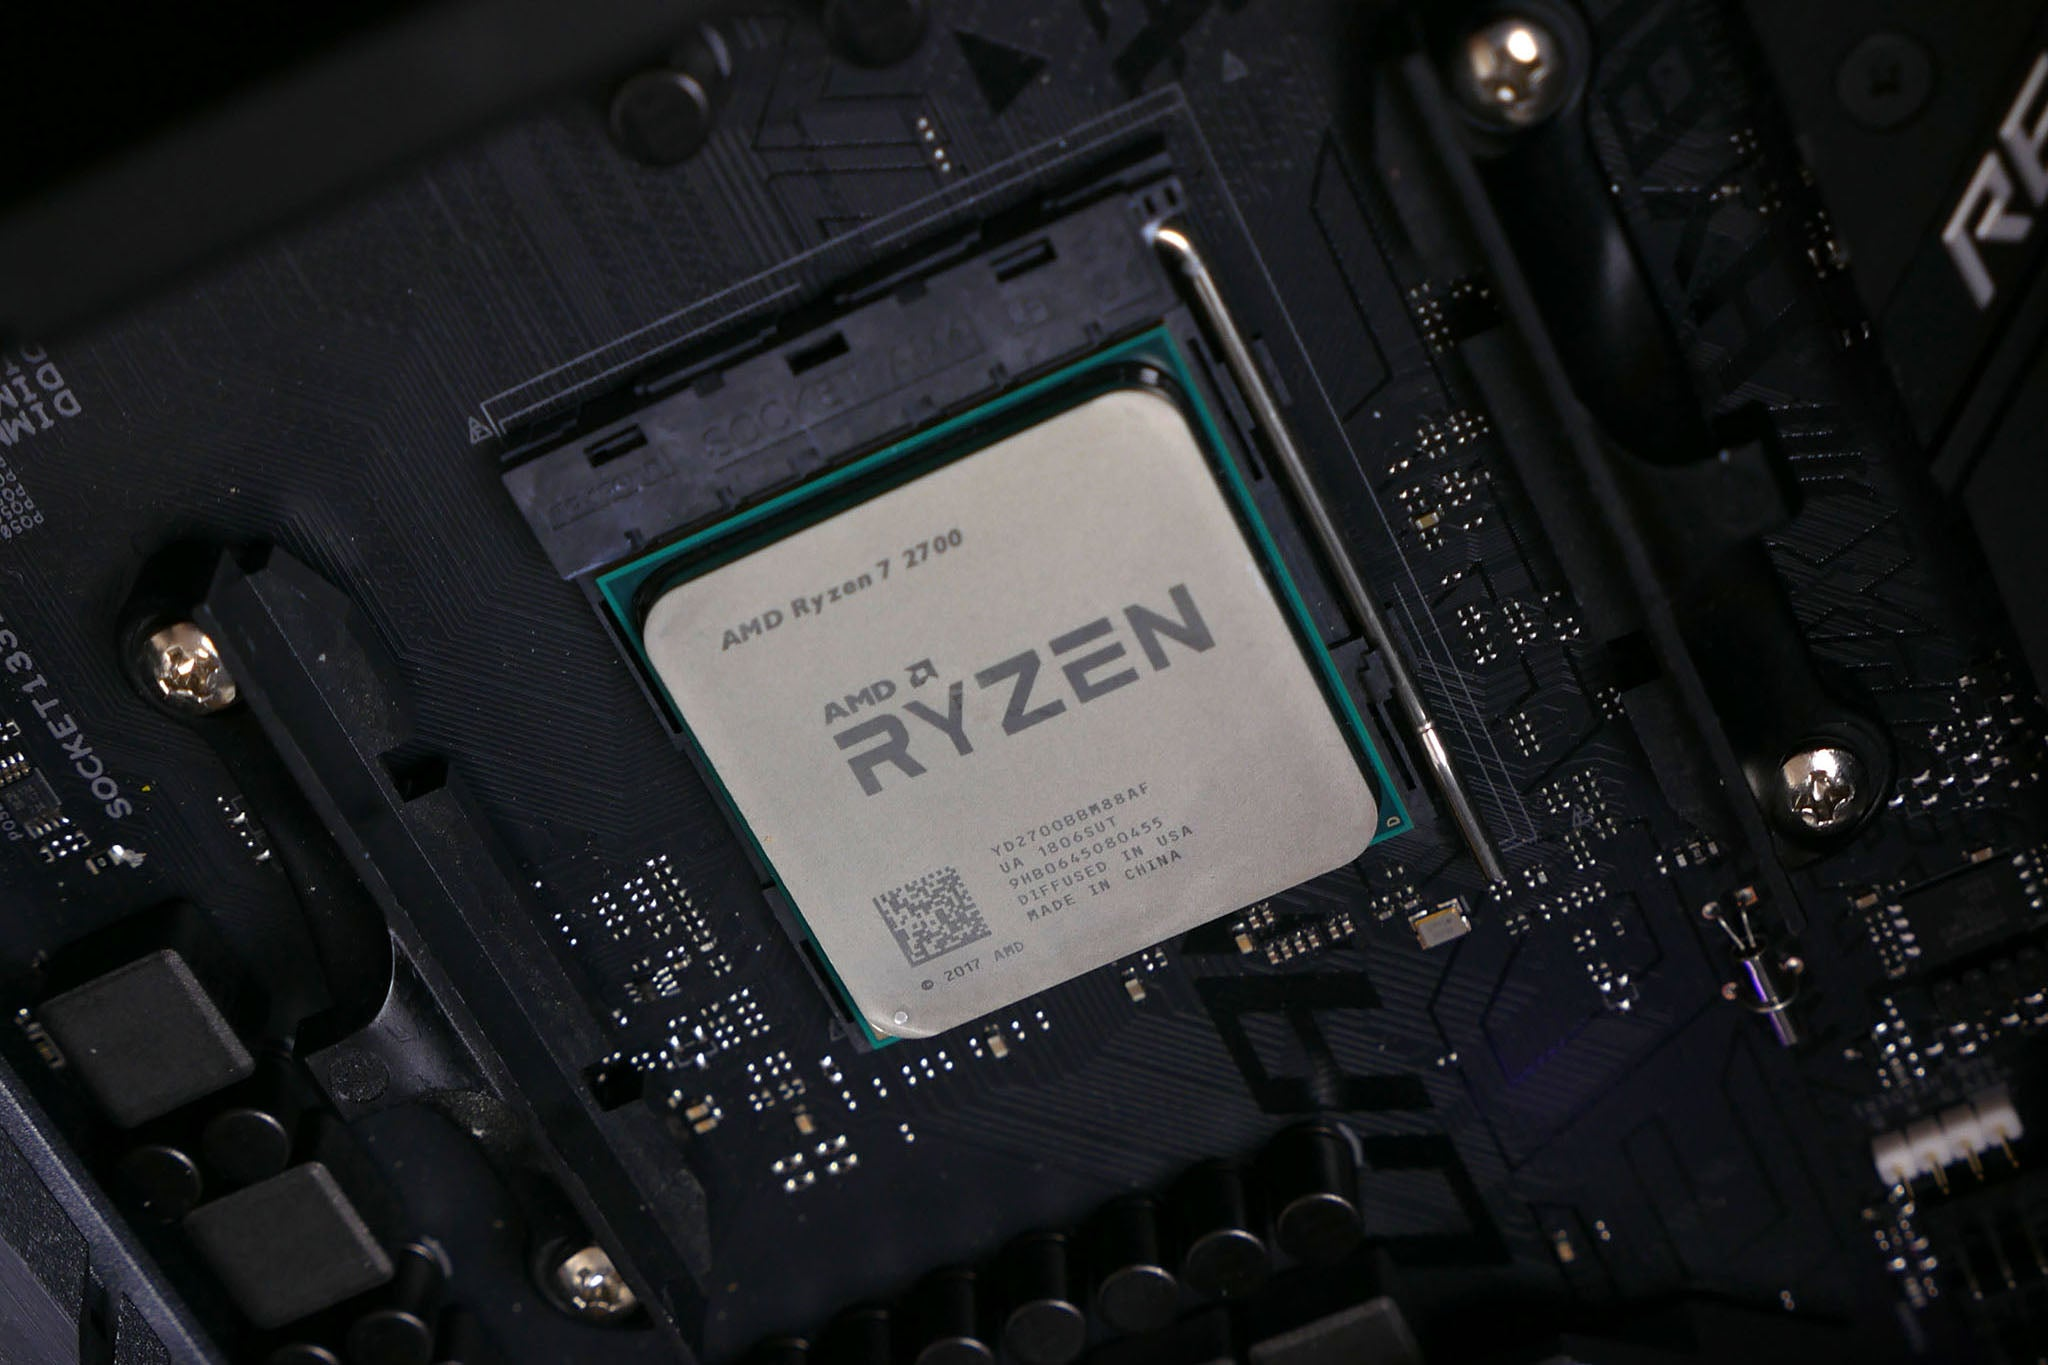 AMD Ryzen 7 2700 & Ryzen 5 2600 Review | Trusted Reviews